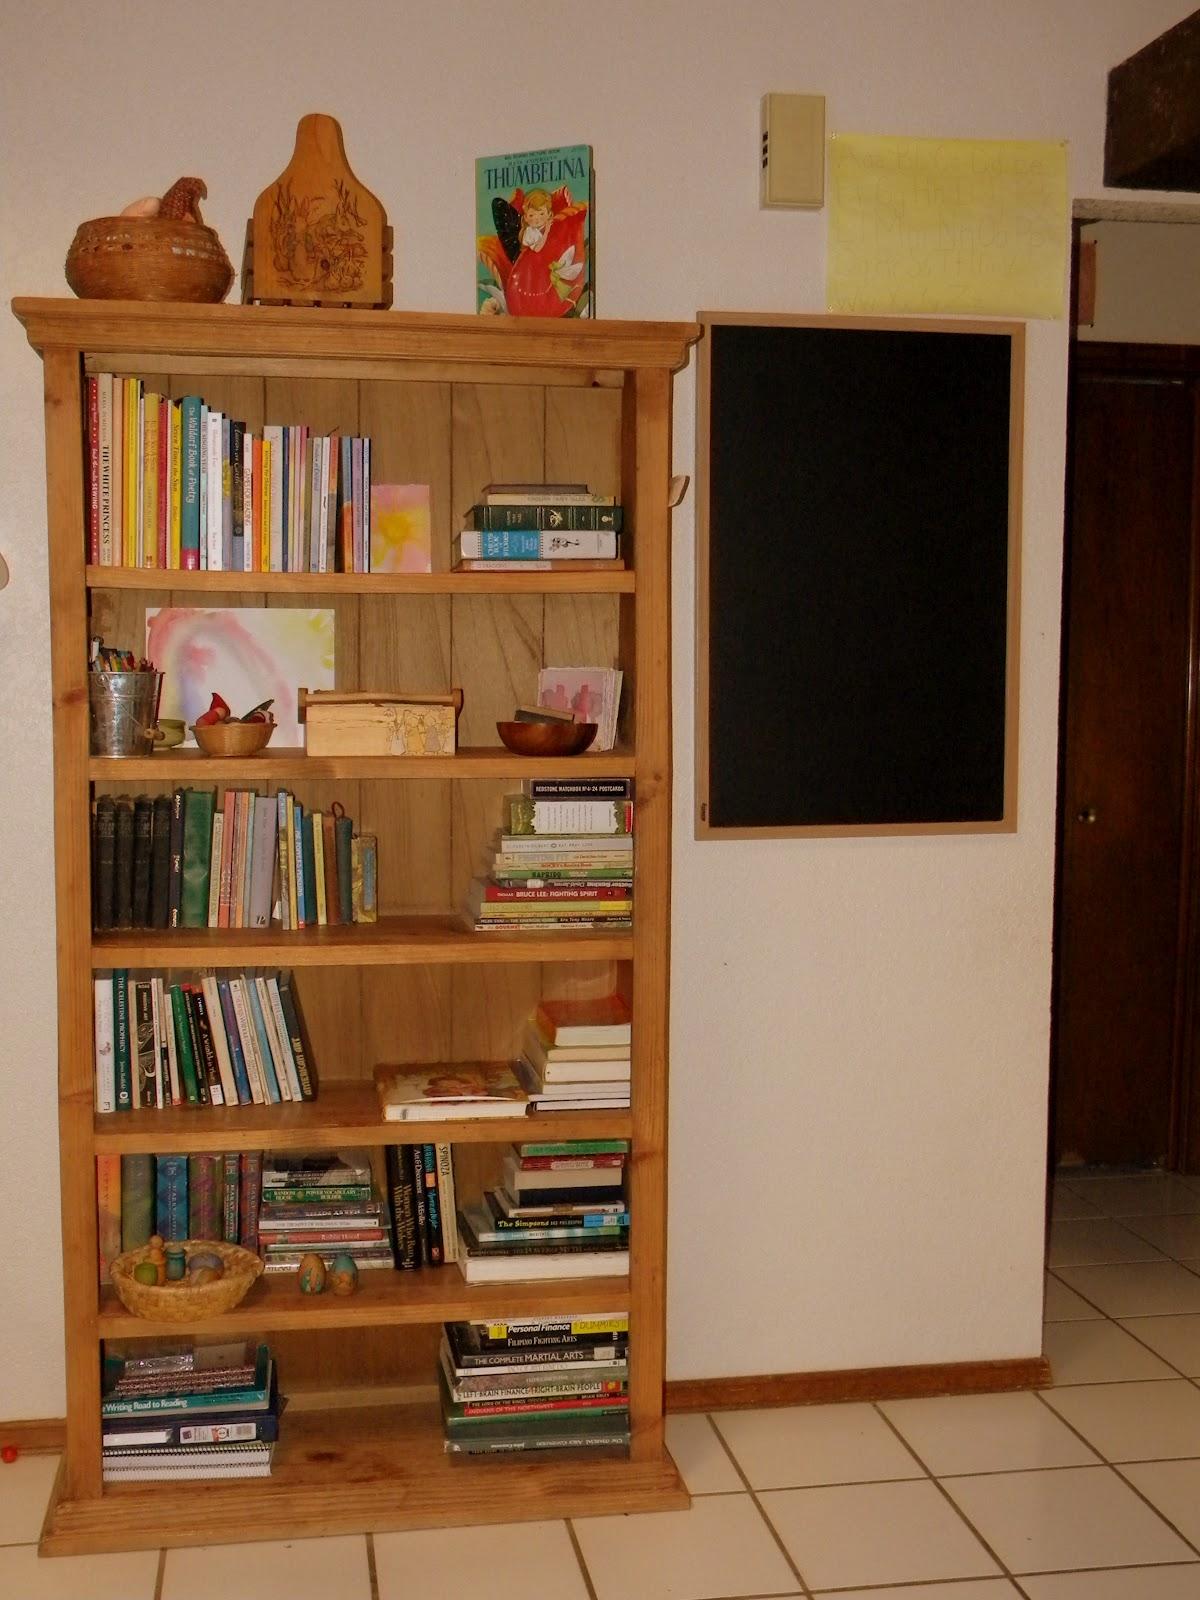 Bookshelf Designs For Home Inside Bookshelves Designs For Home (View 7 of 15)